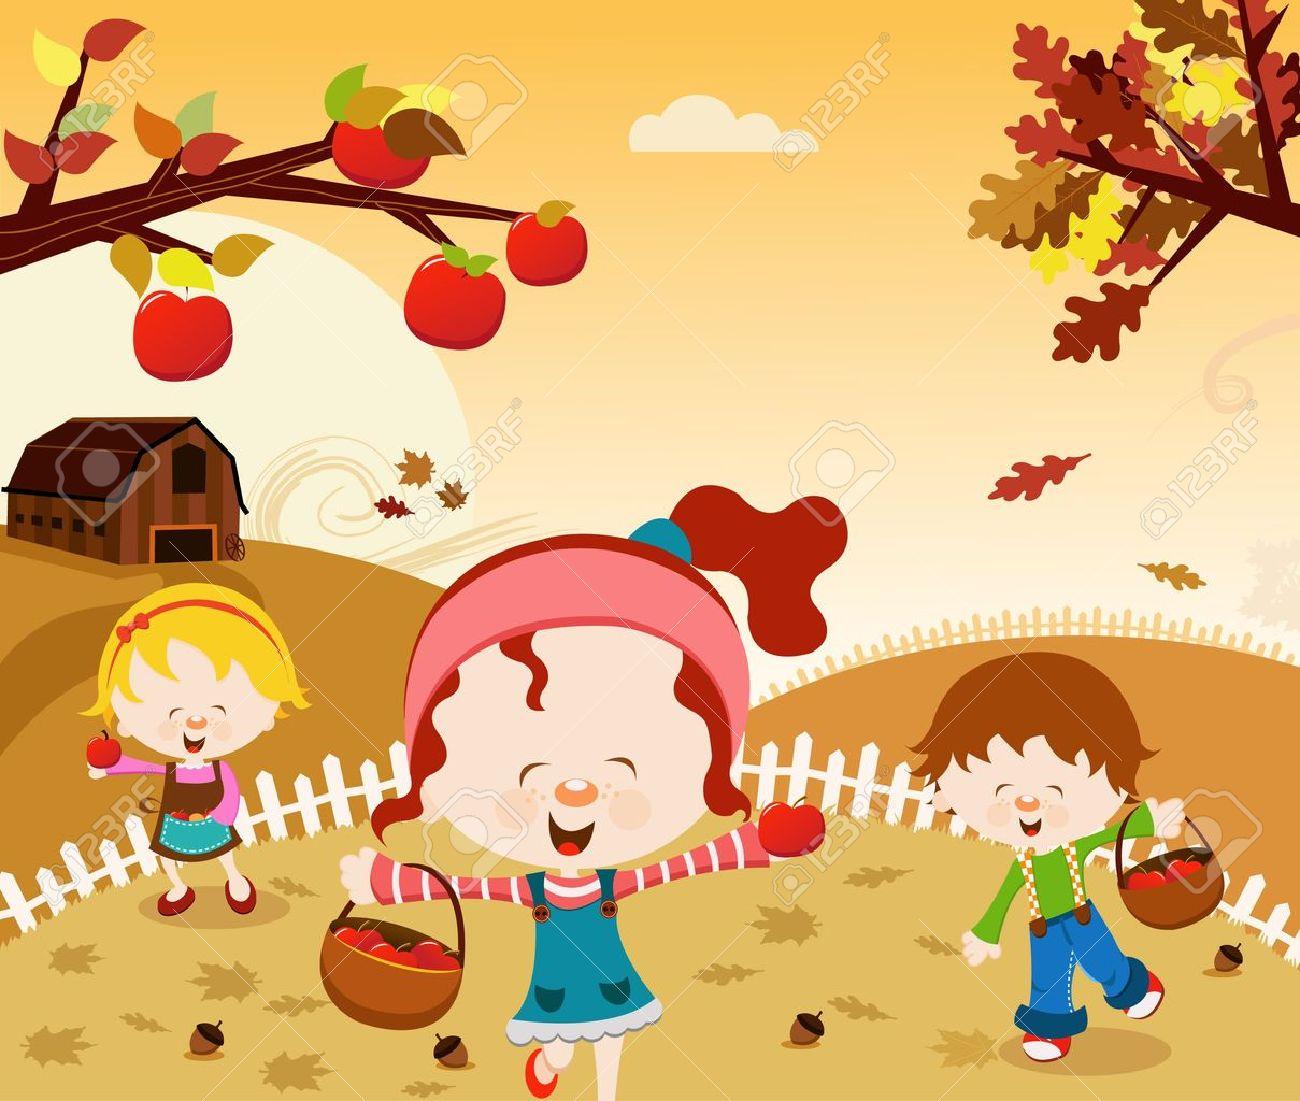 http://previews.123rf.com/images/pinipin/pinipin1109/pinipin110900001/10640288-Happy-Harvest-Stock-Vector-autumn-cartoon-apple.jpg